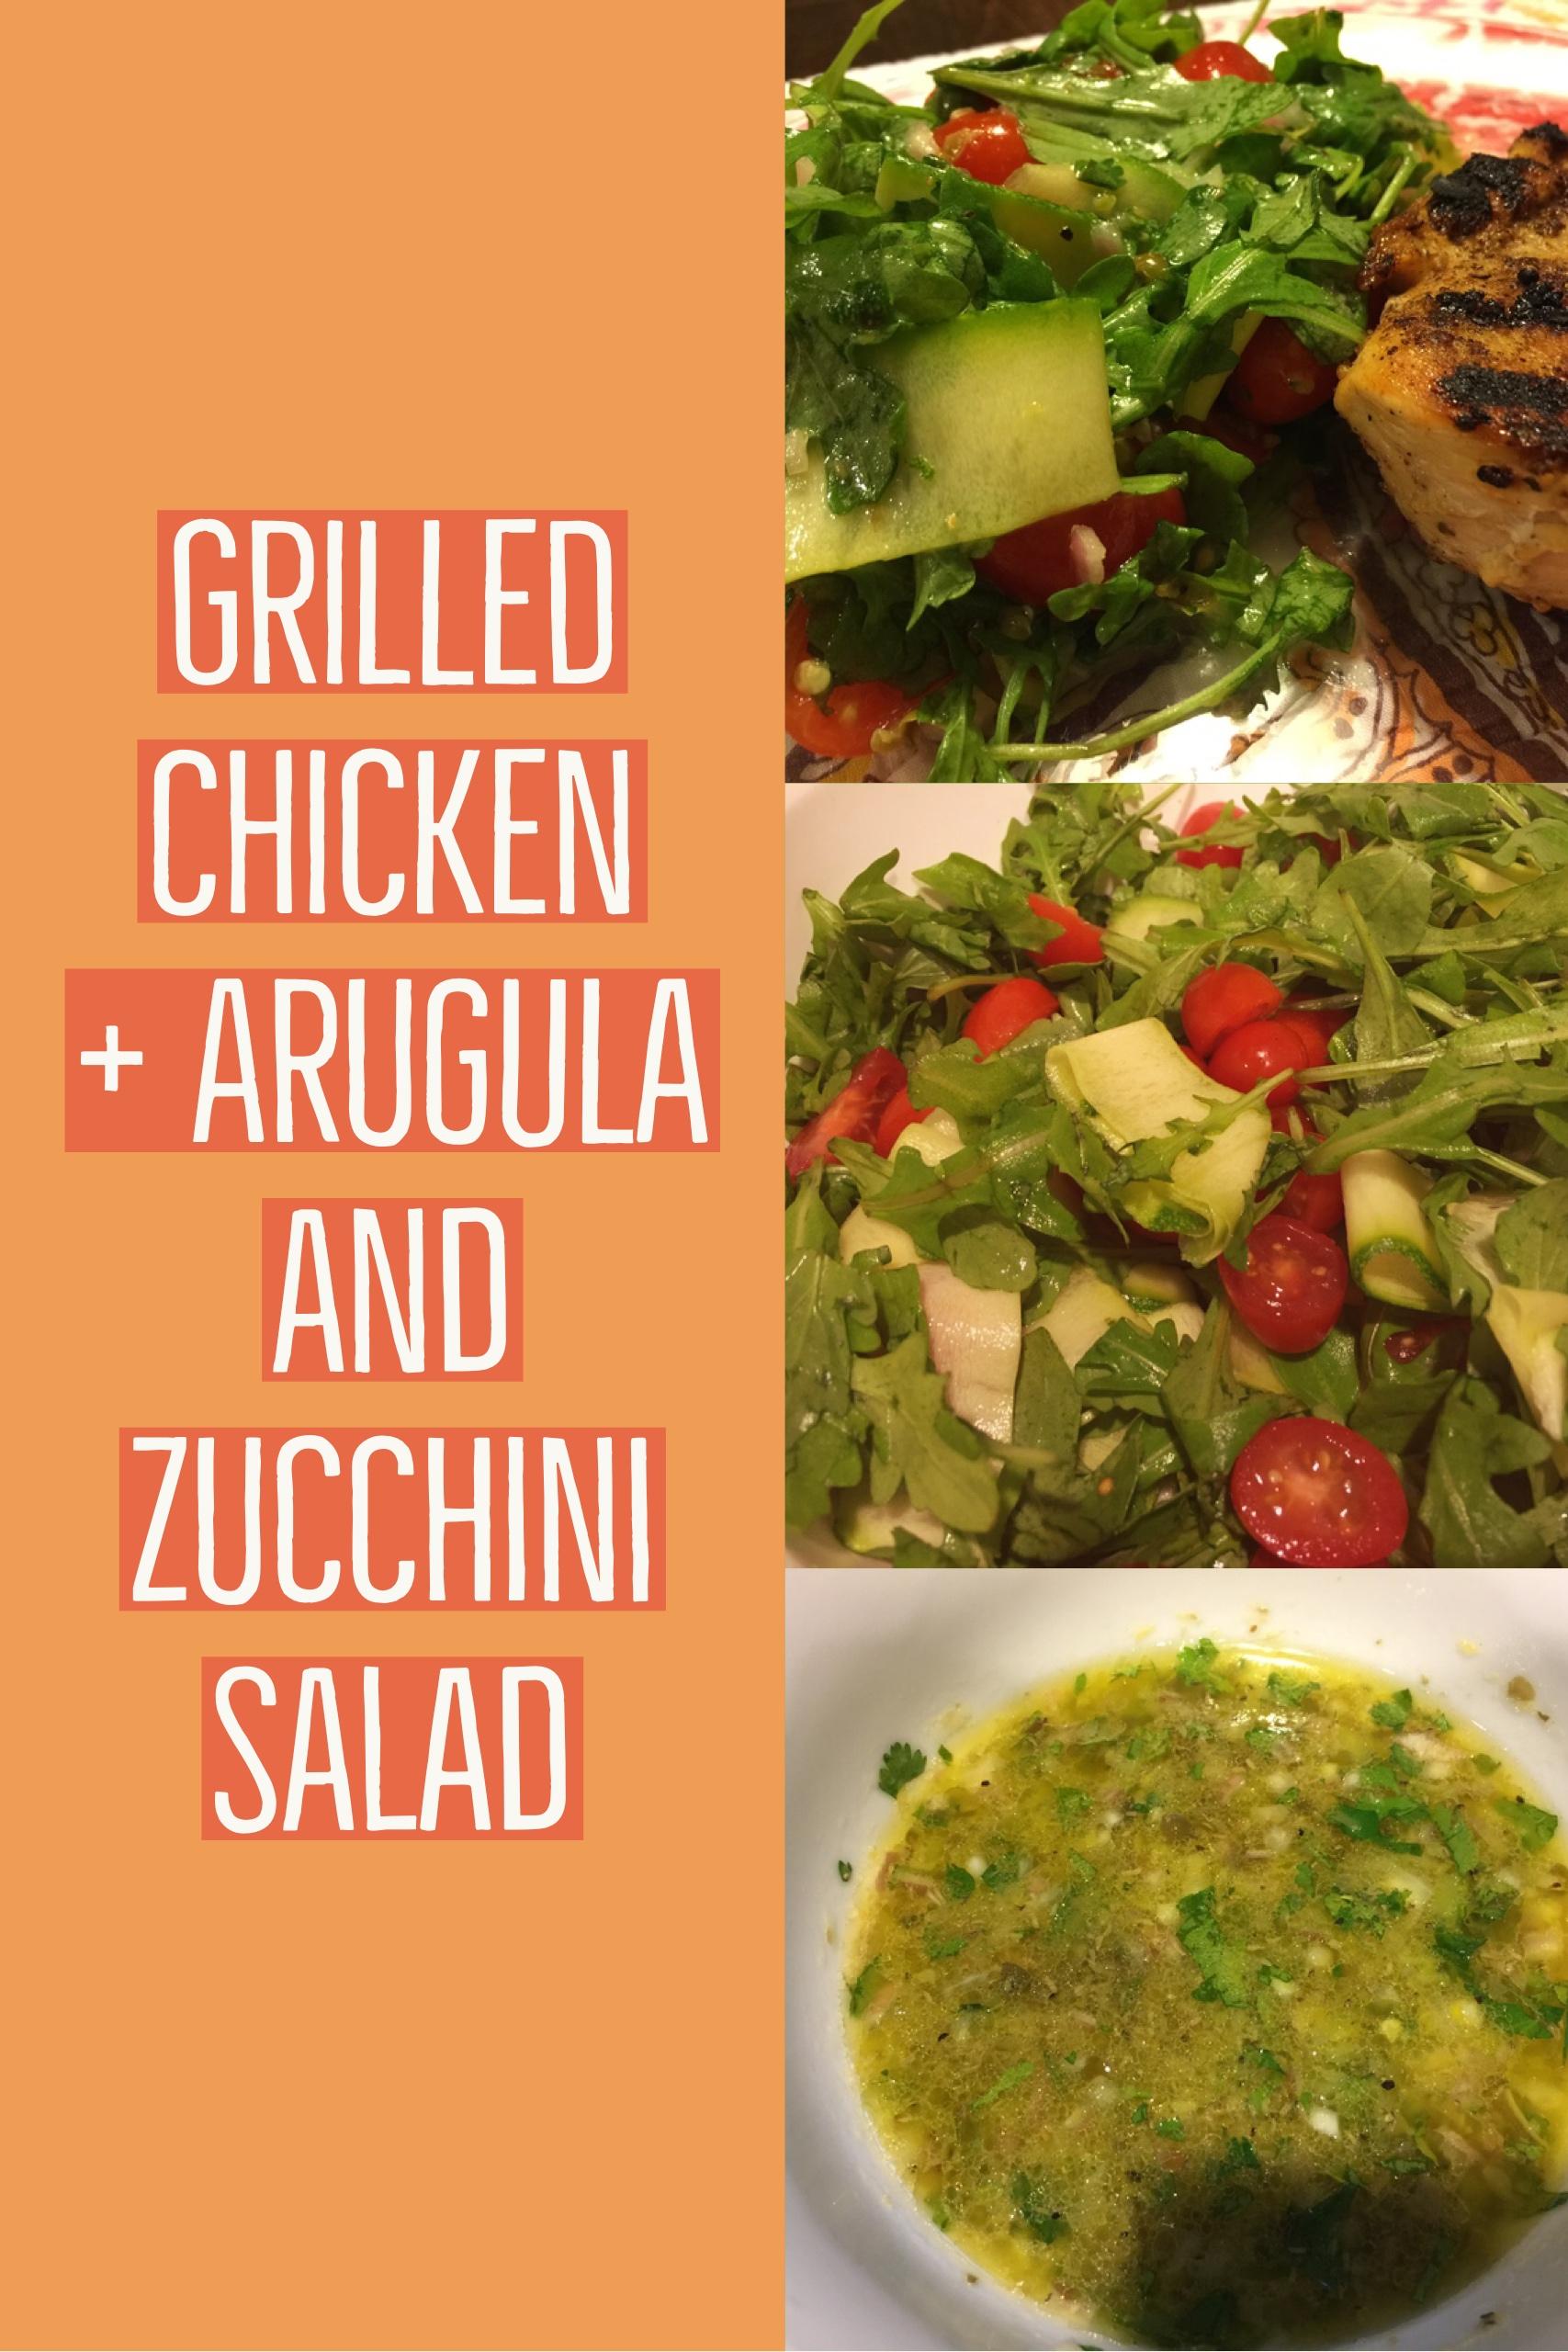 Grilled Chicken Zucchini pin.jpeg